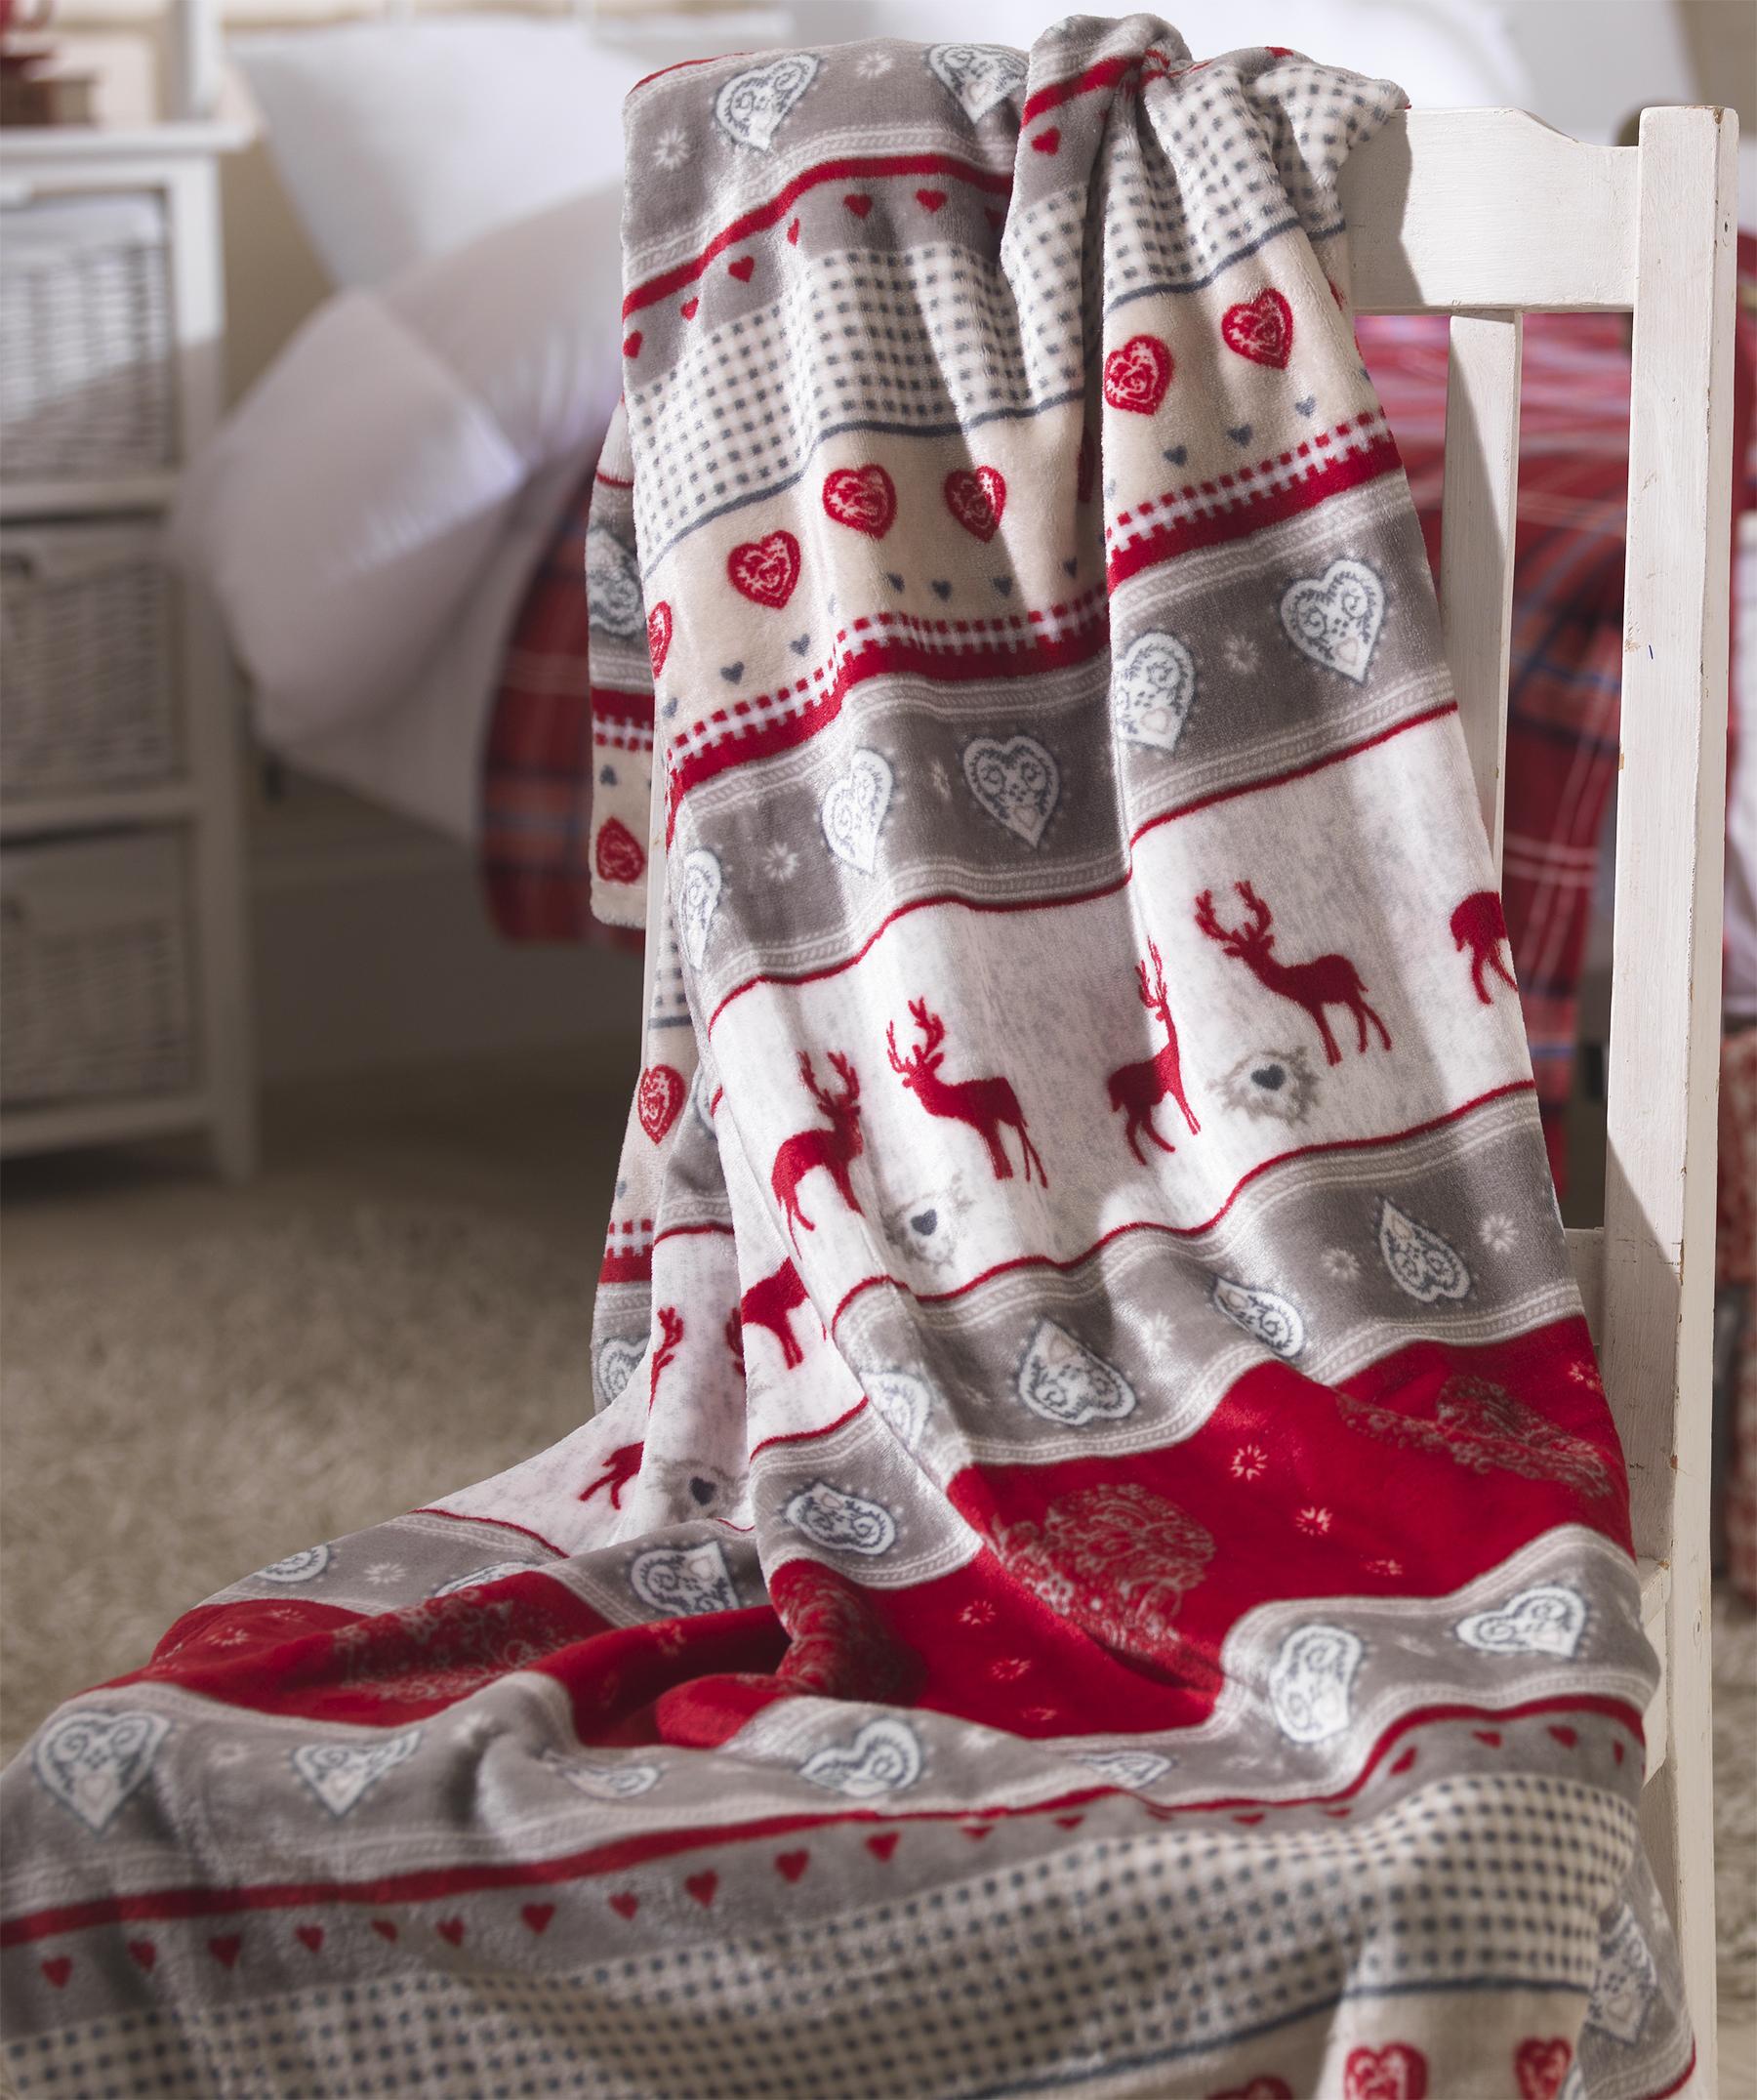 Red Stag Fleece Christmas Throw Warm Festive Winter Reindeer Blanket 5055952480955  eBay